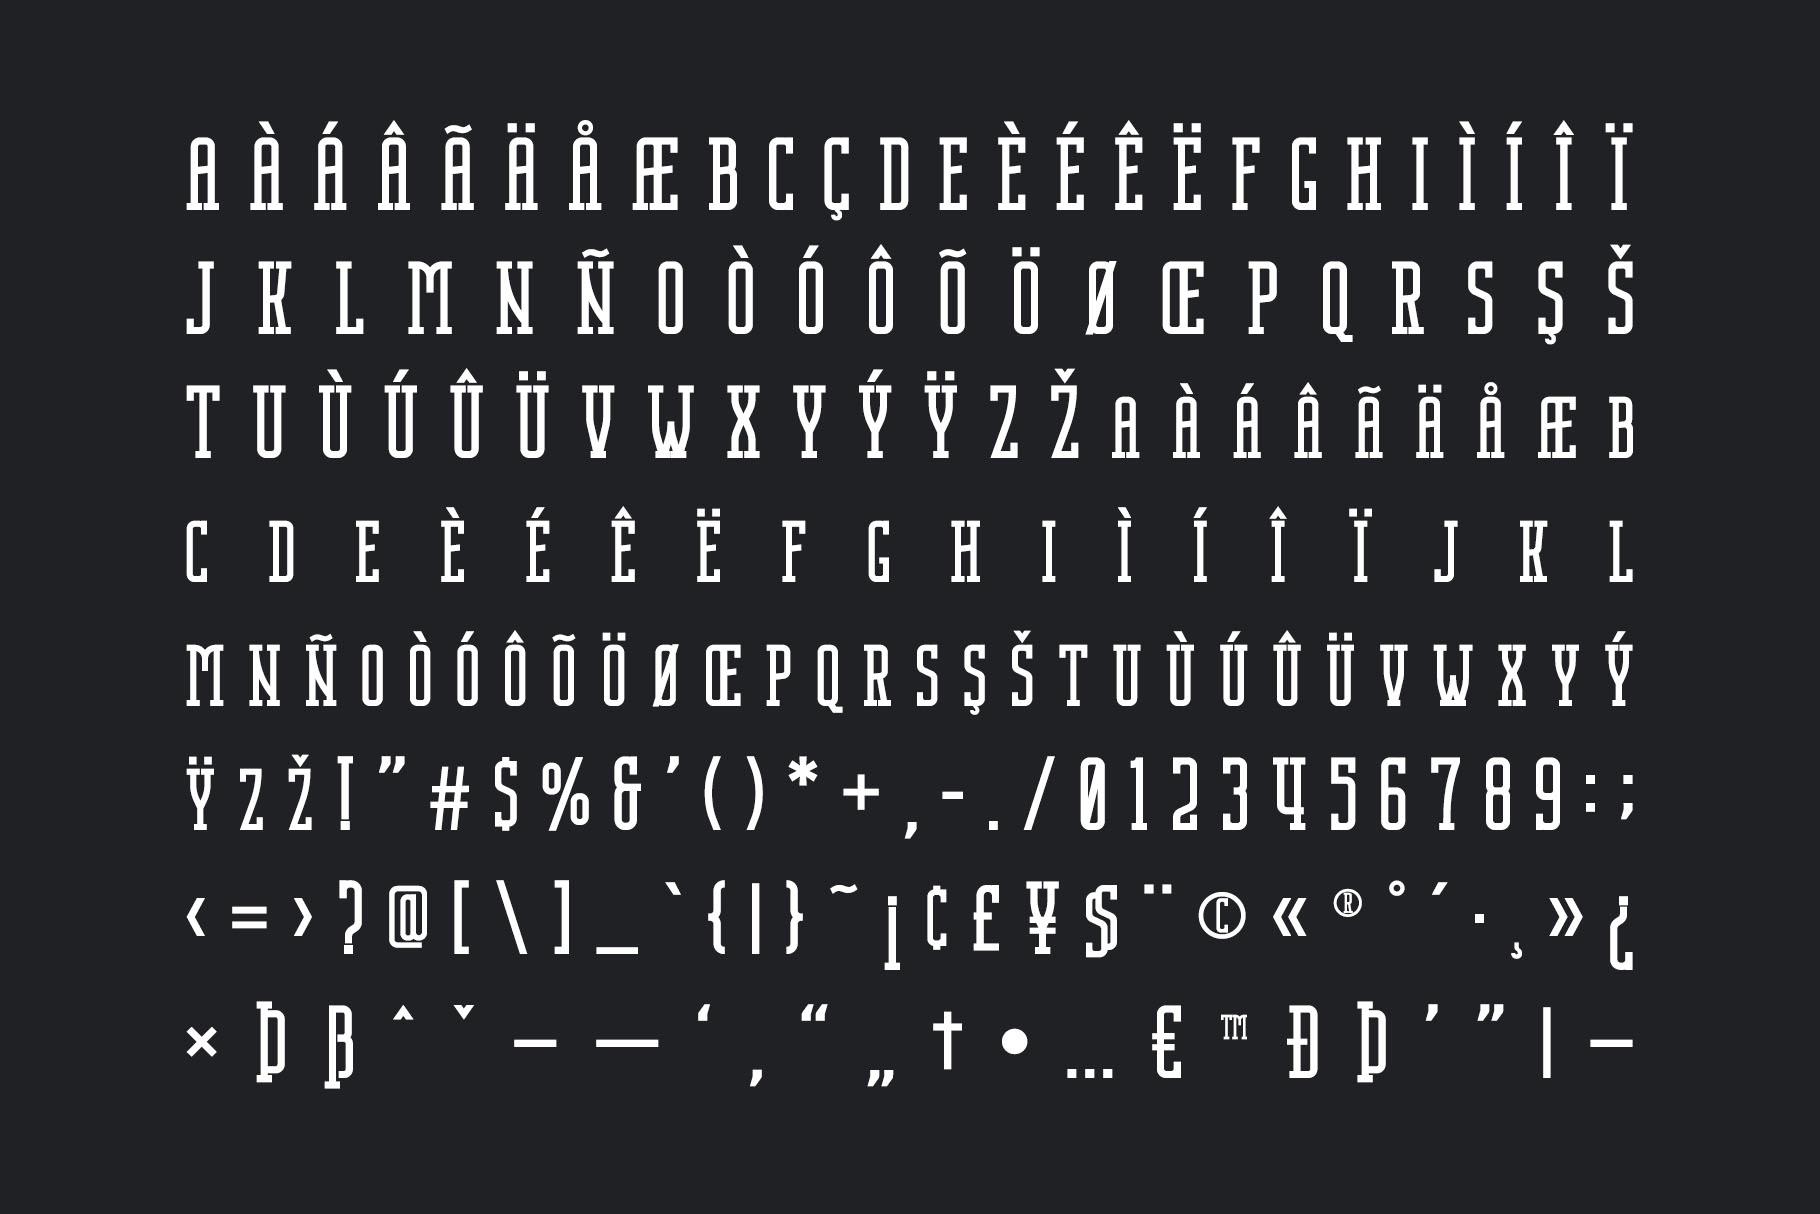 Nordin Slab - Condensed Slab Serif example image 8